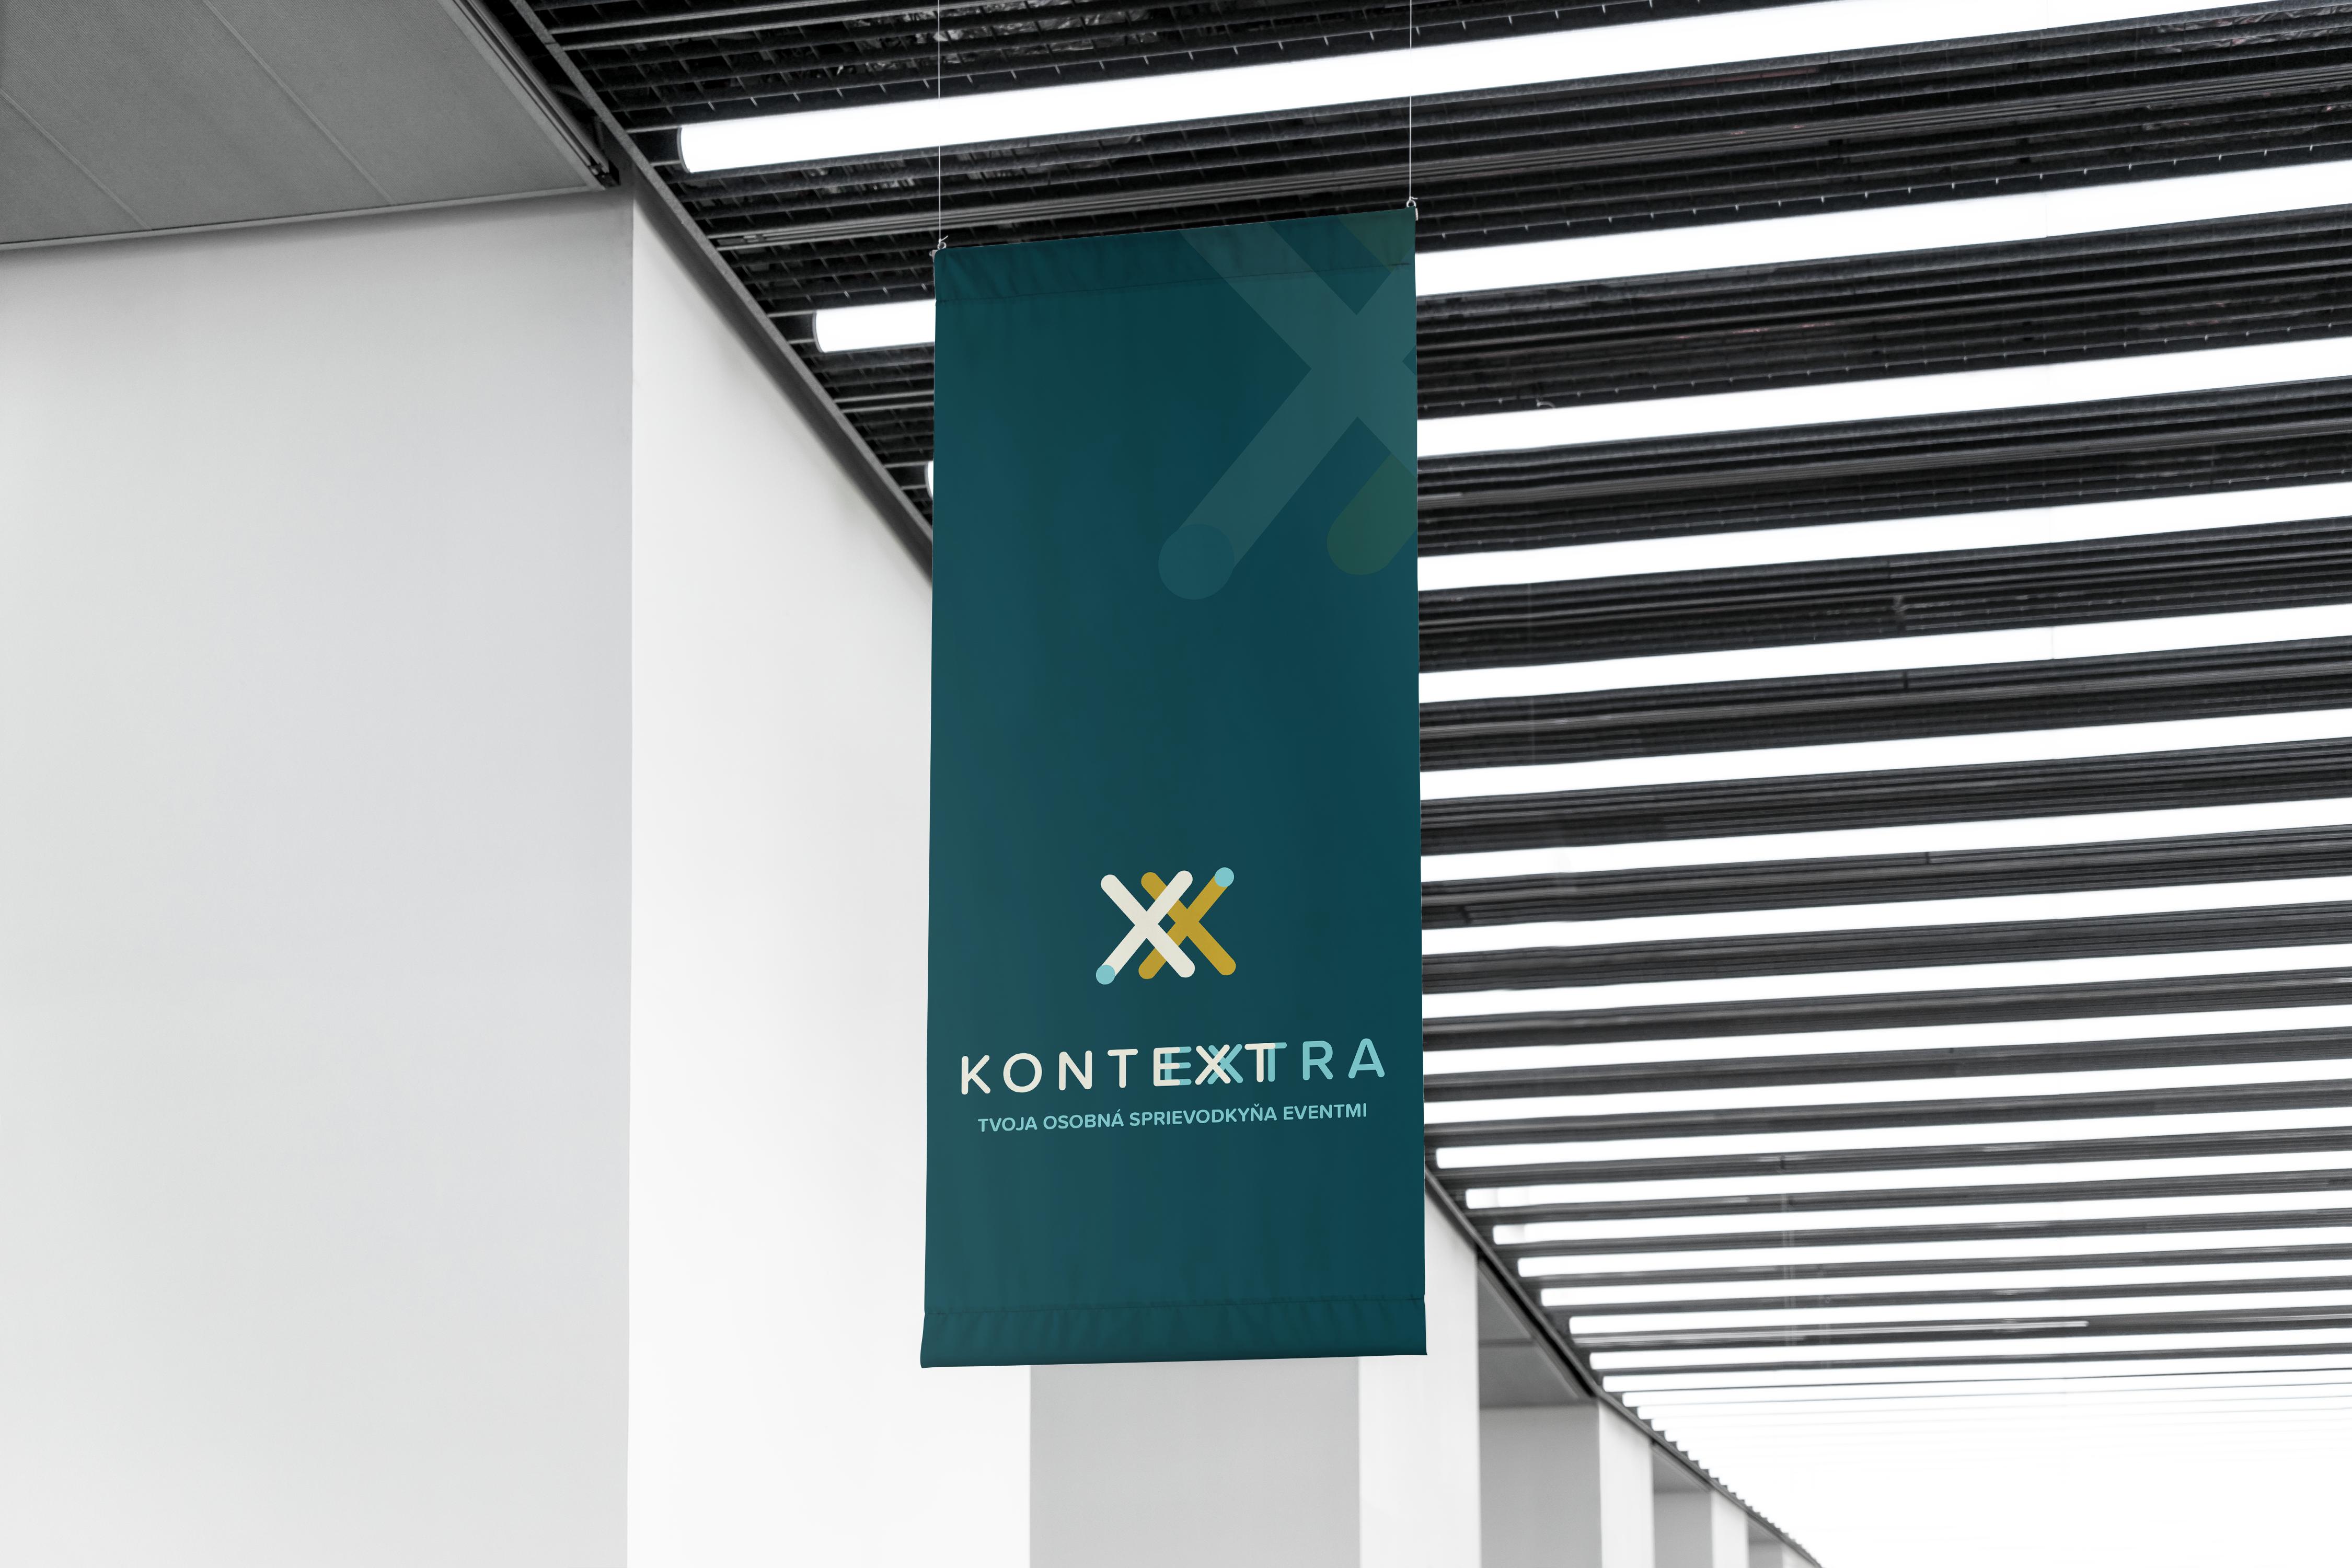 kontextra logo